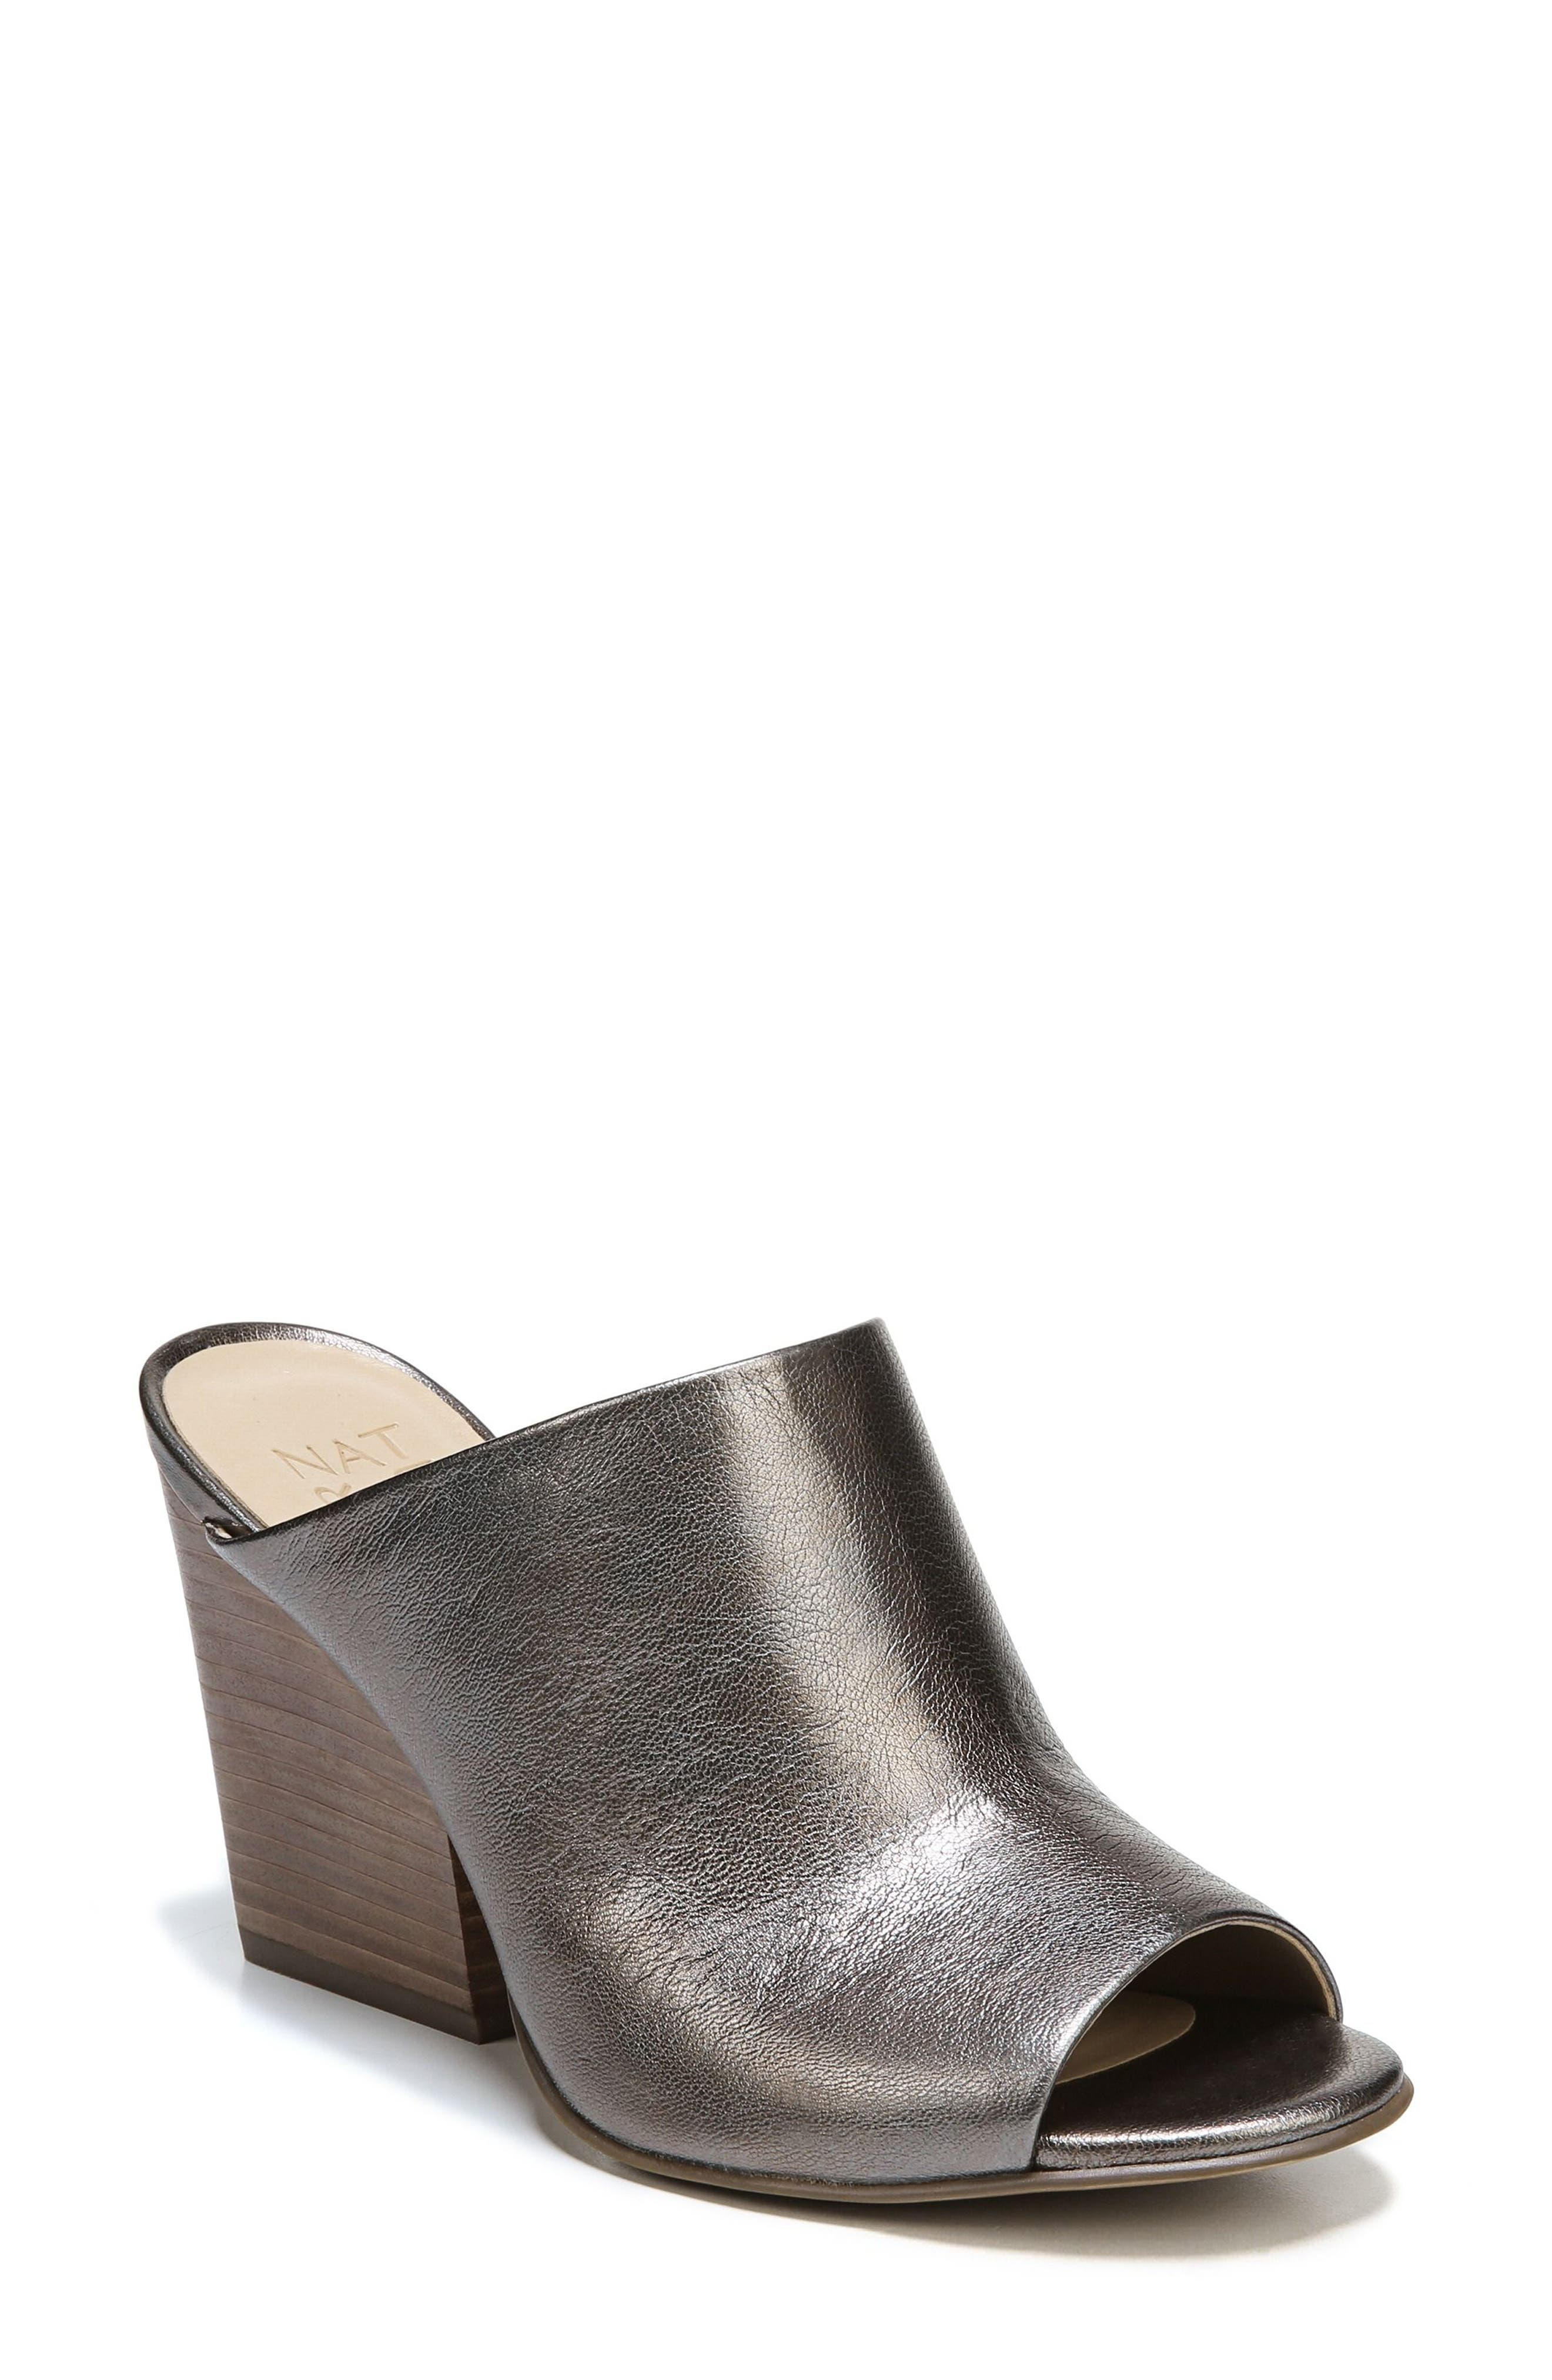 Sloan Sandal,                         Main,                         color, Gunmetal Leather